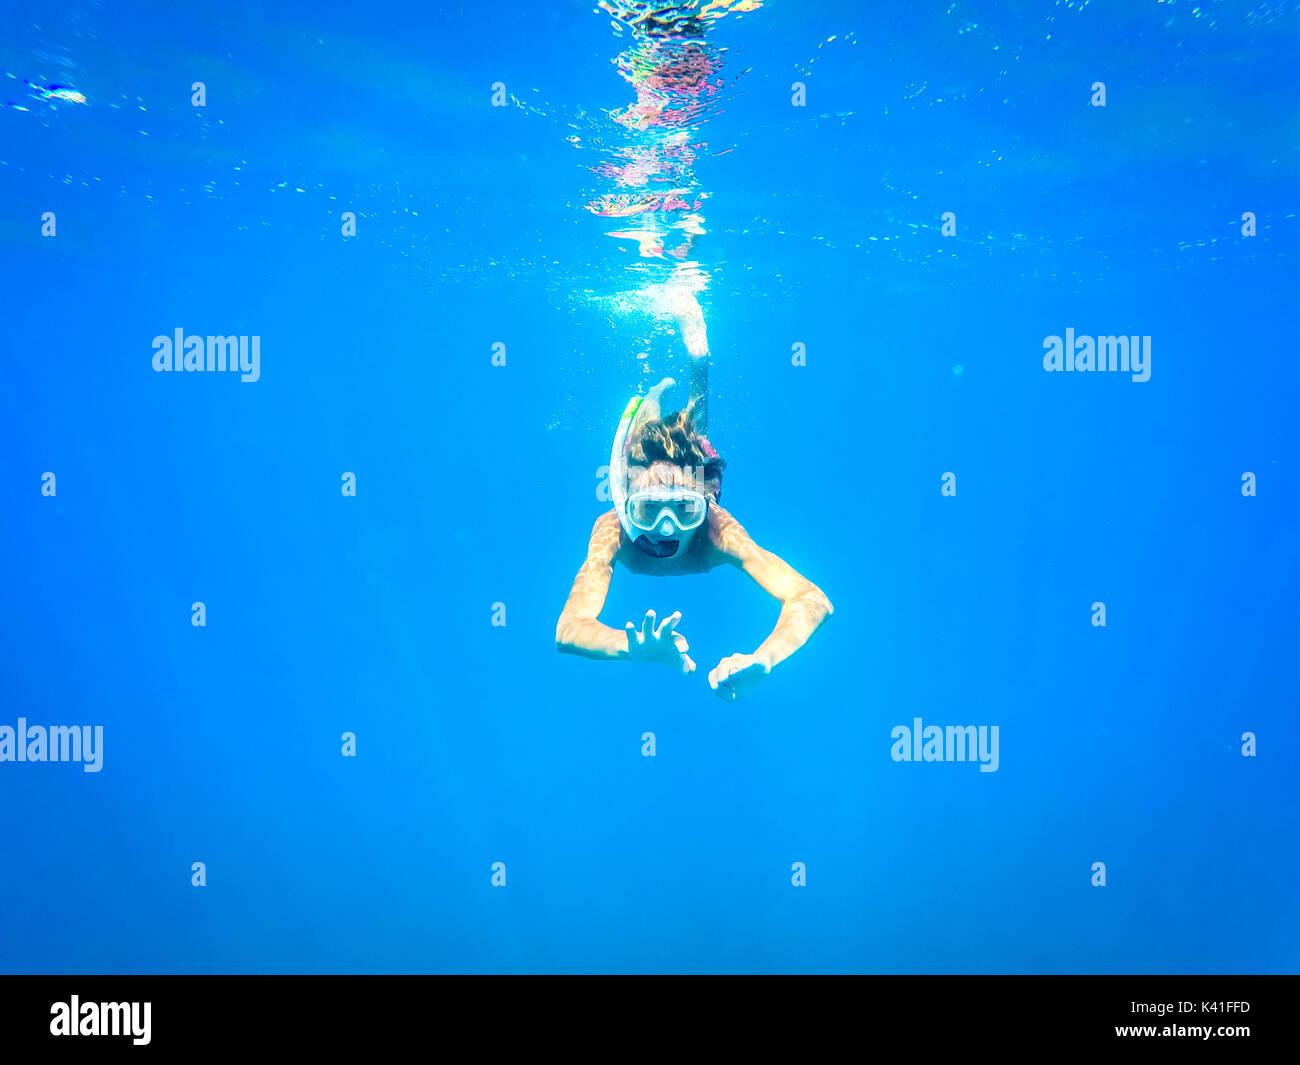 Teenager Spaß im Meer unter Wasser - Sommer - Sizilien Mittelmeer Stockfoto